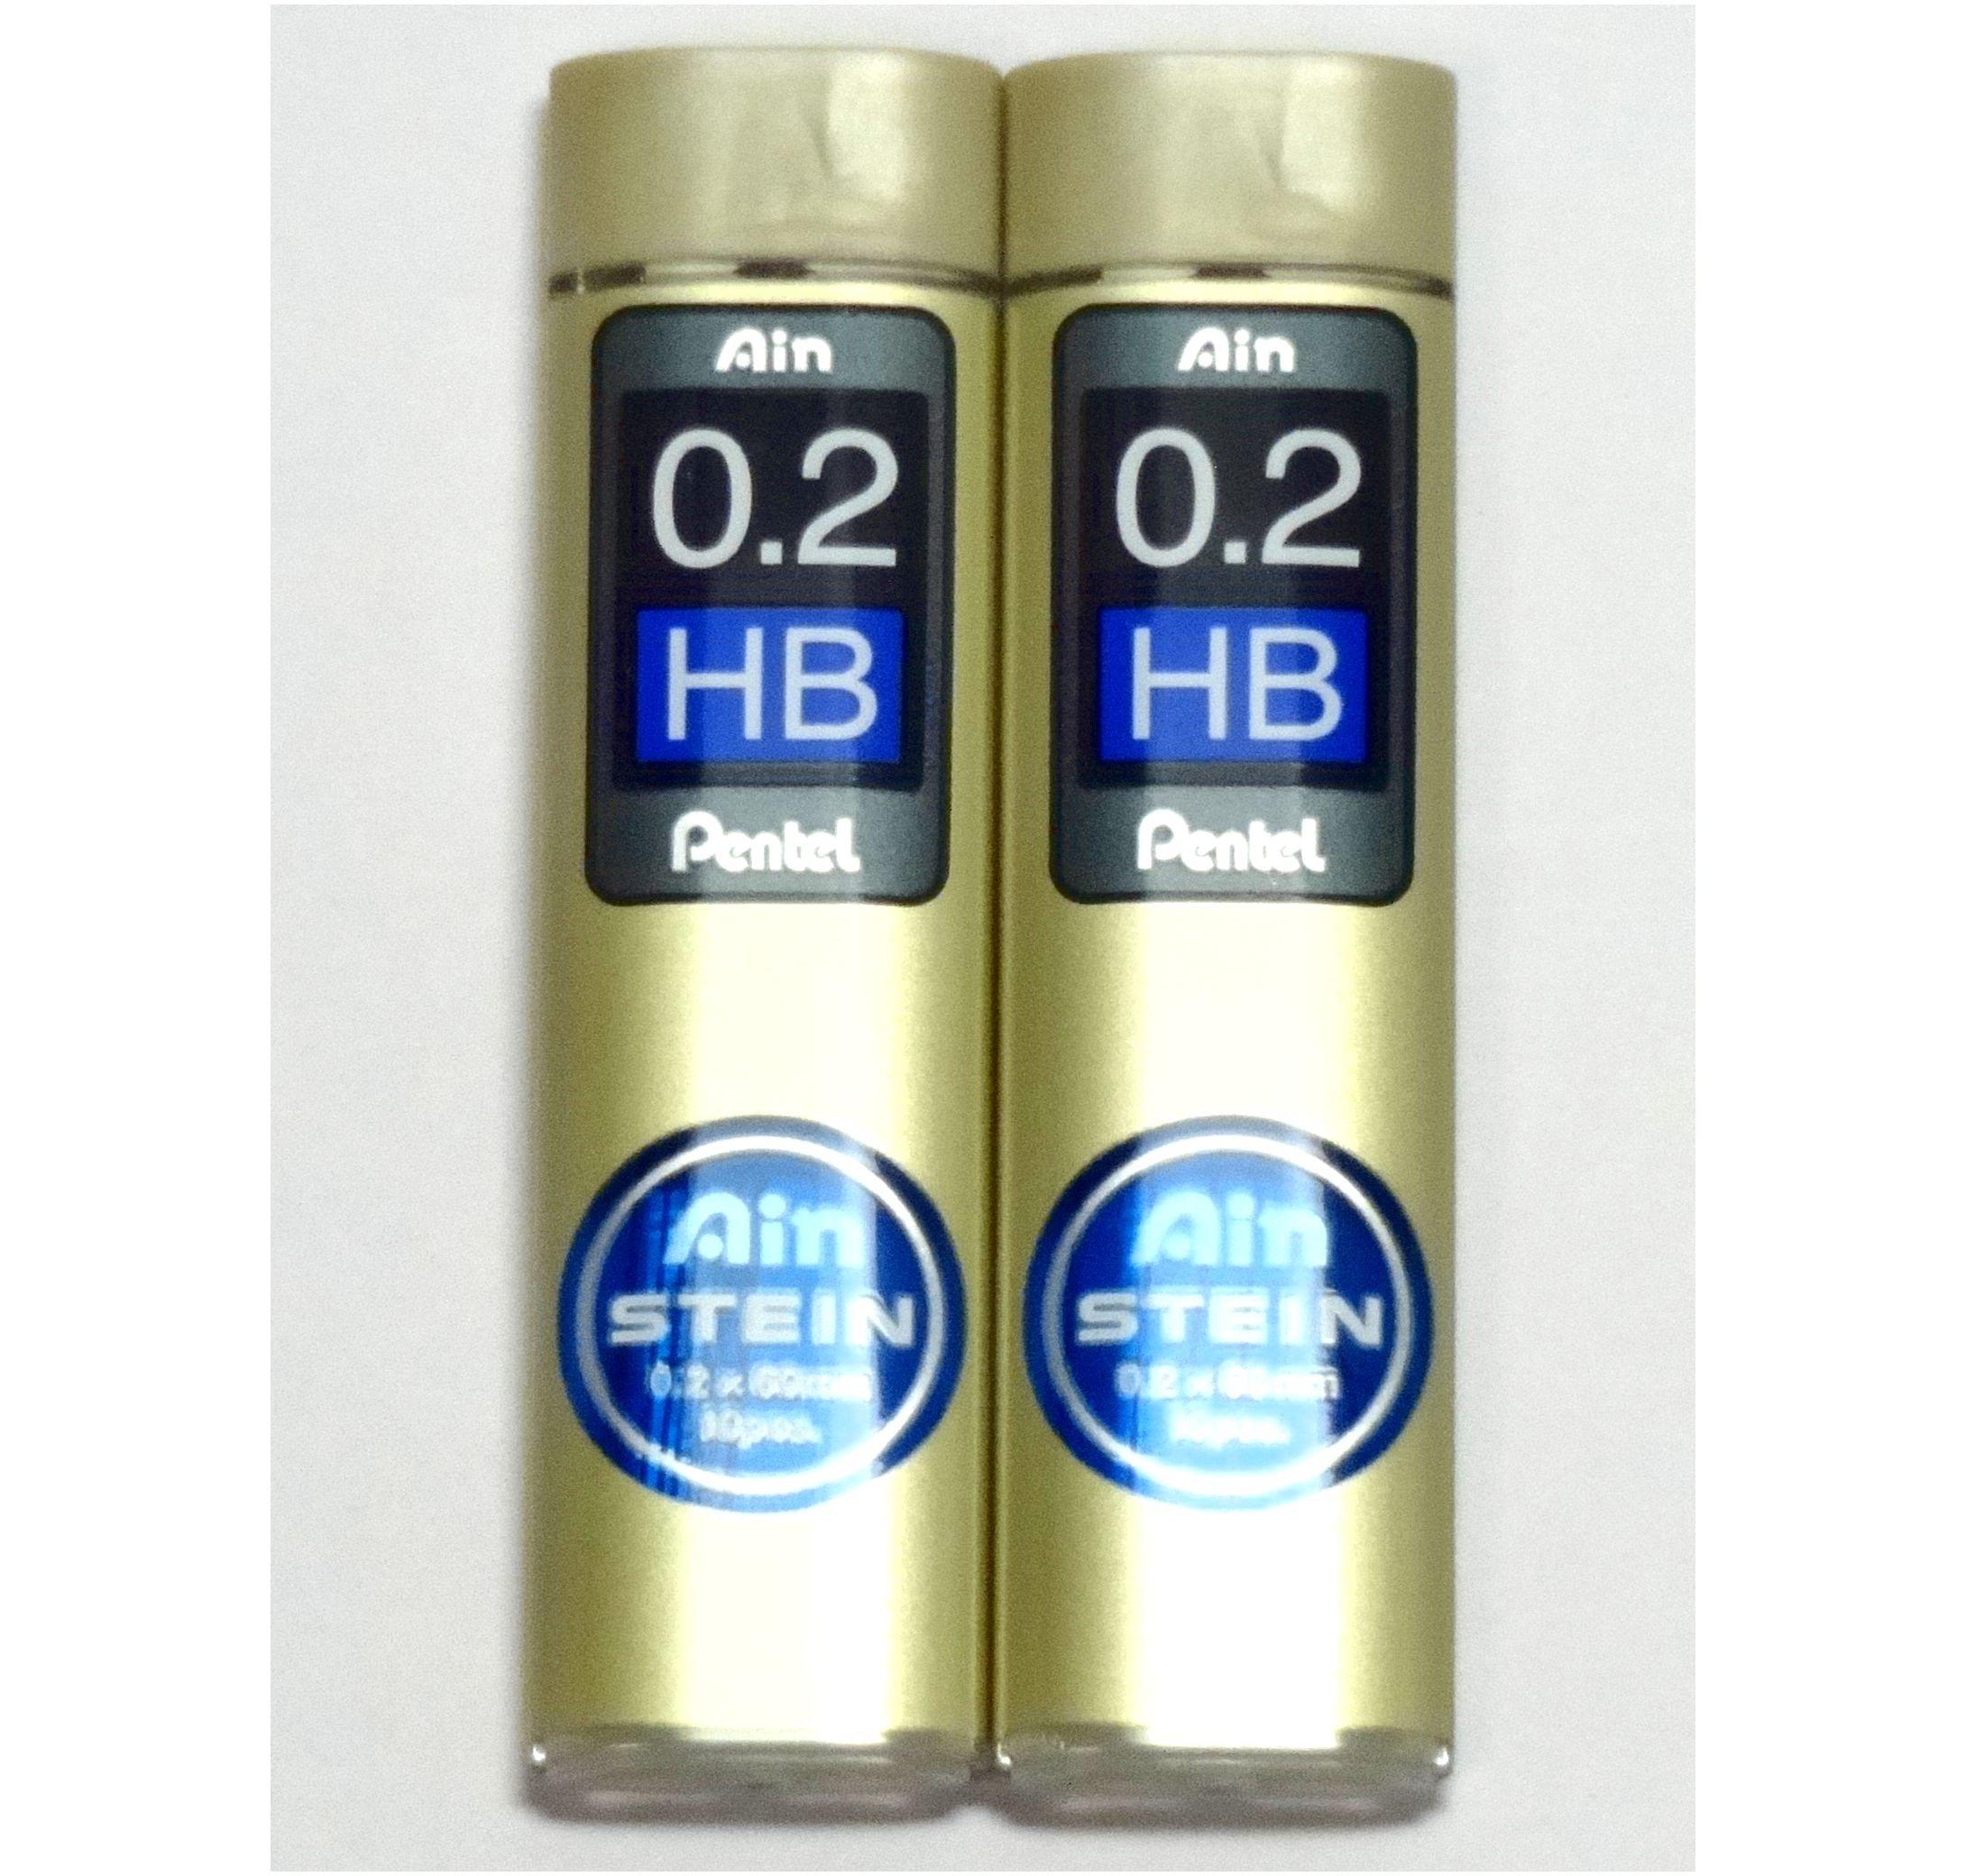 Pentel Ain Stein 20 Minas (2 Tubos) 0.2mm HB